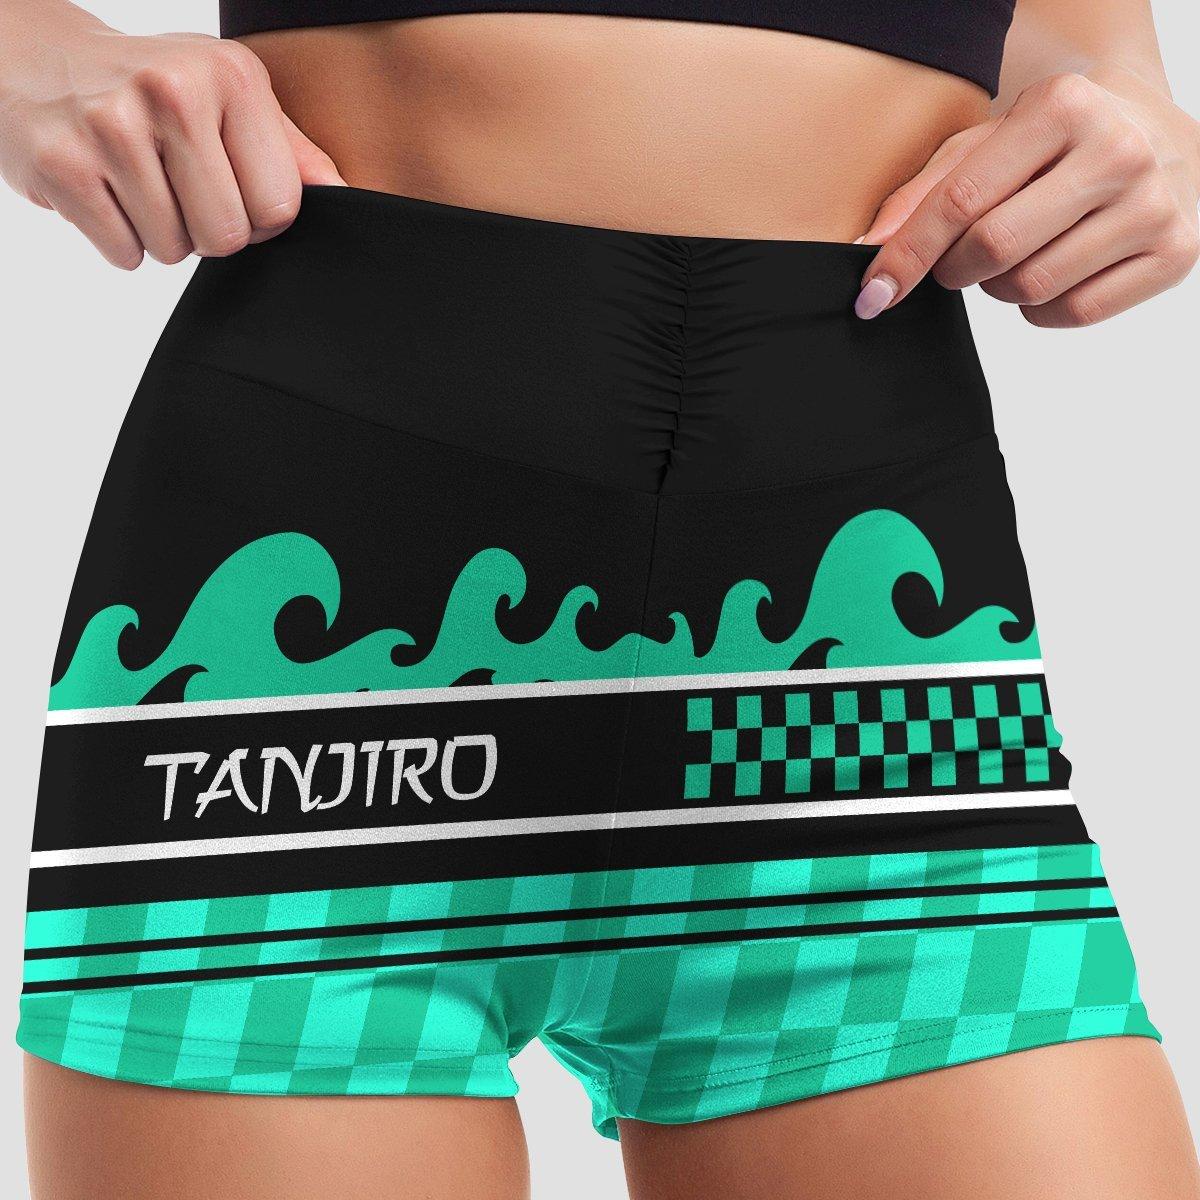 summer tanjiro active wear set 530948 - Anime Swimsuits